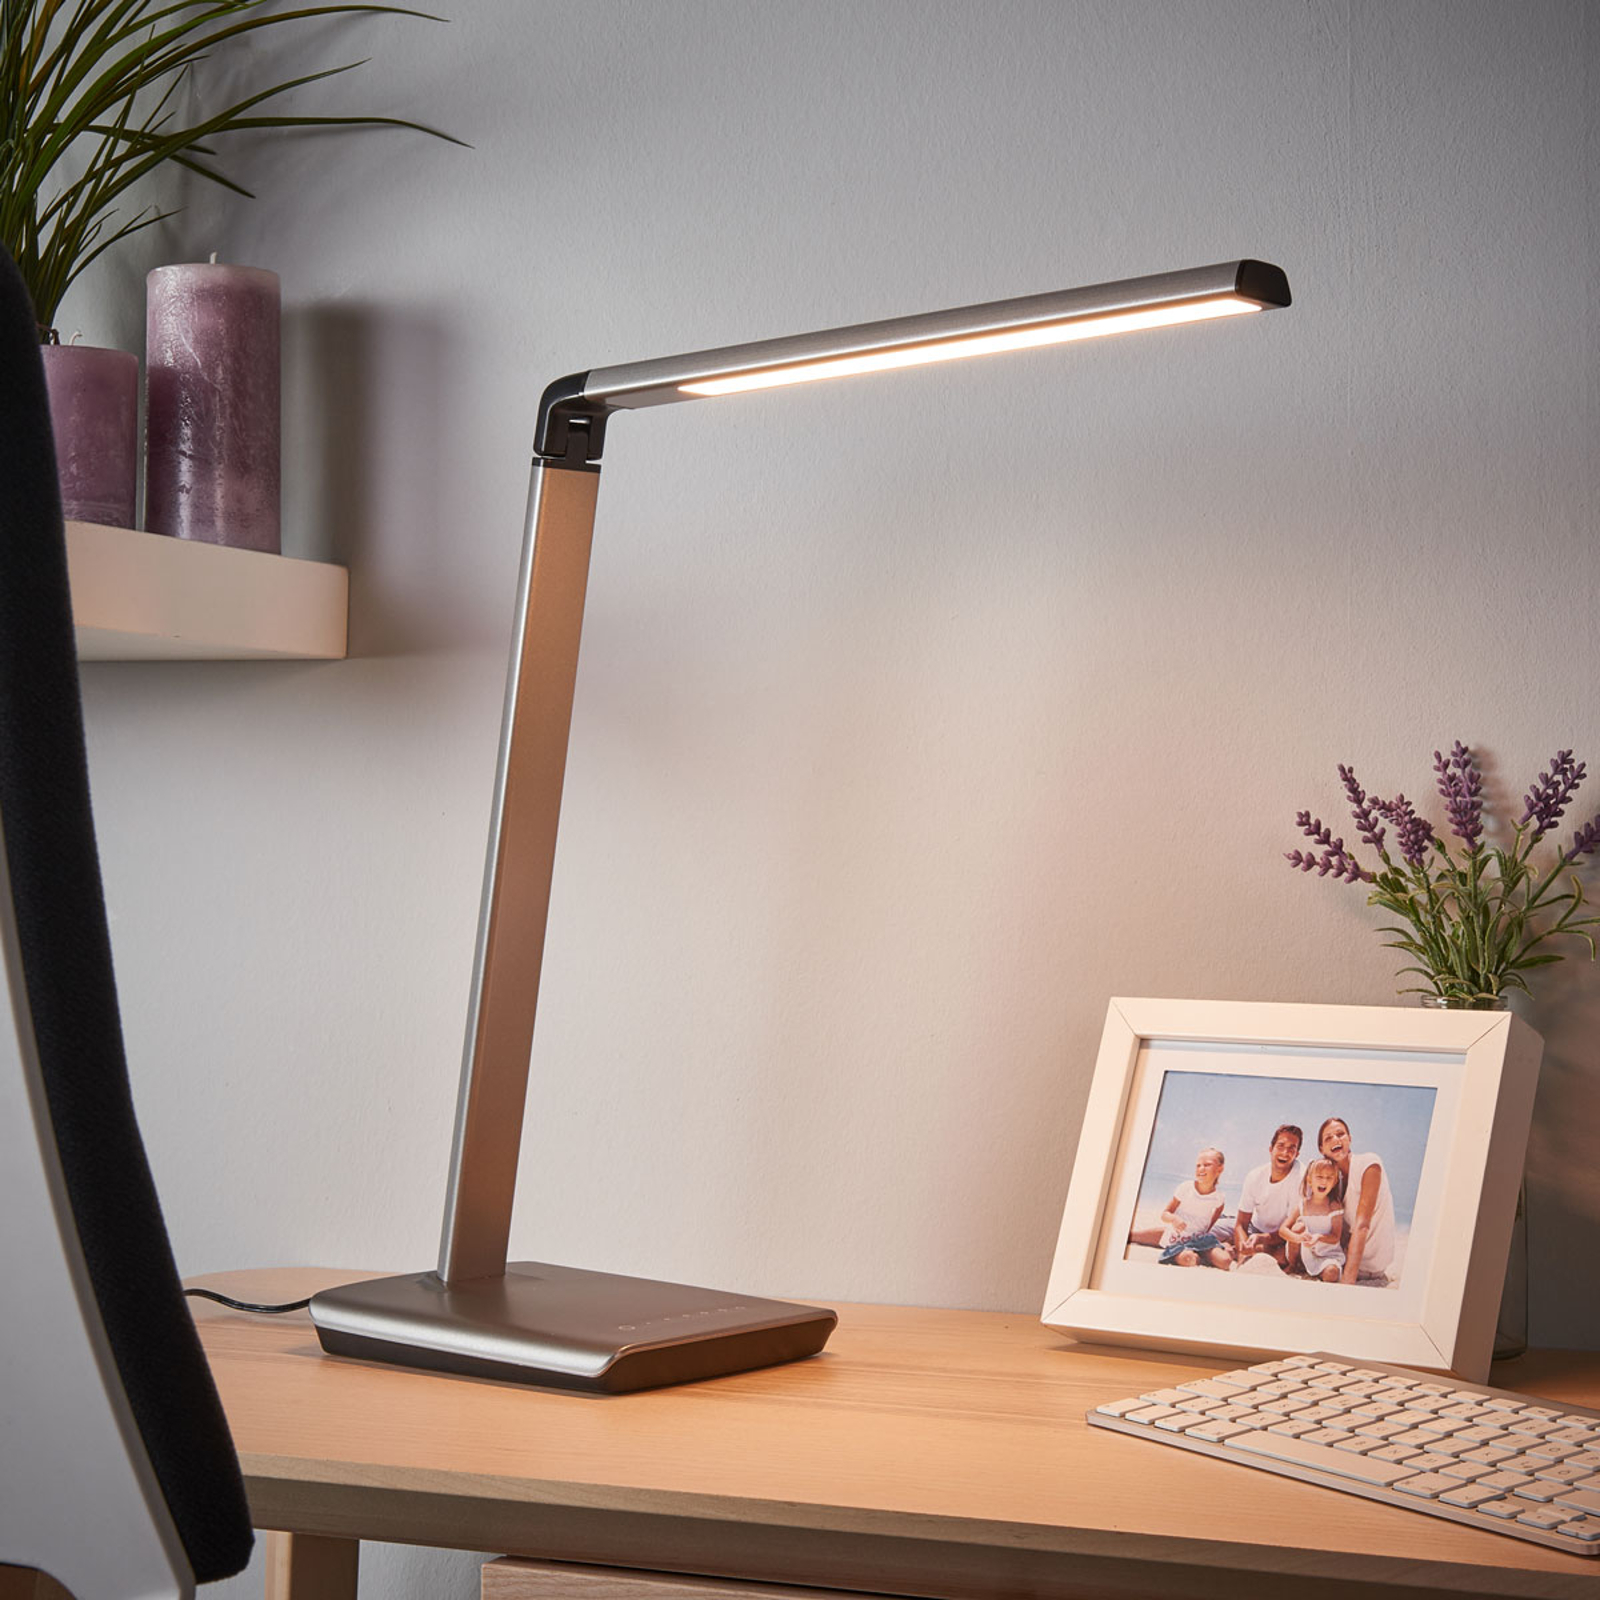 Metallicgraue LED-Tischlampe Kuno mit Dimmer, USB